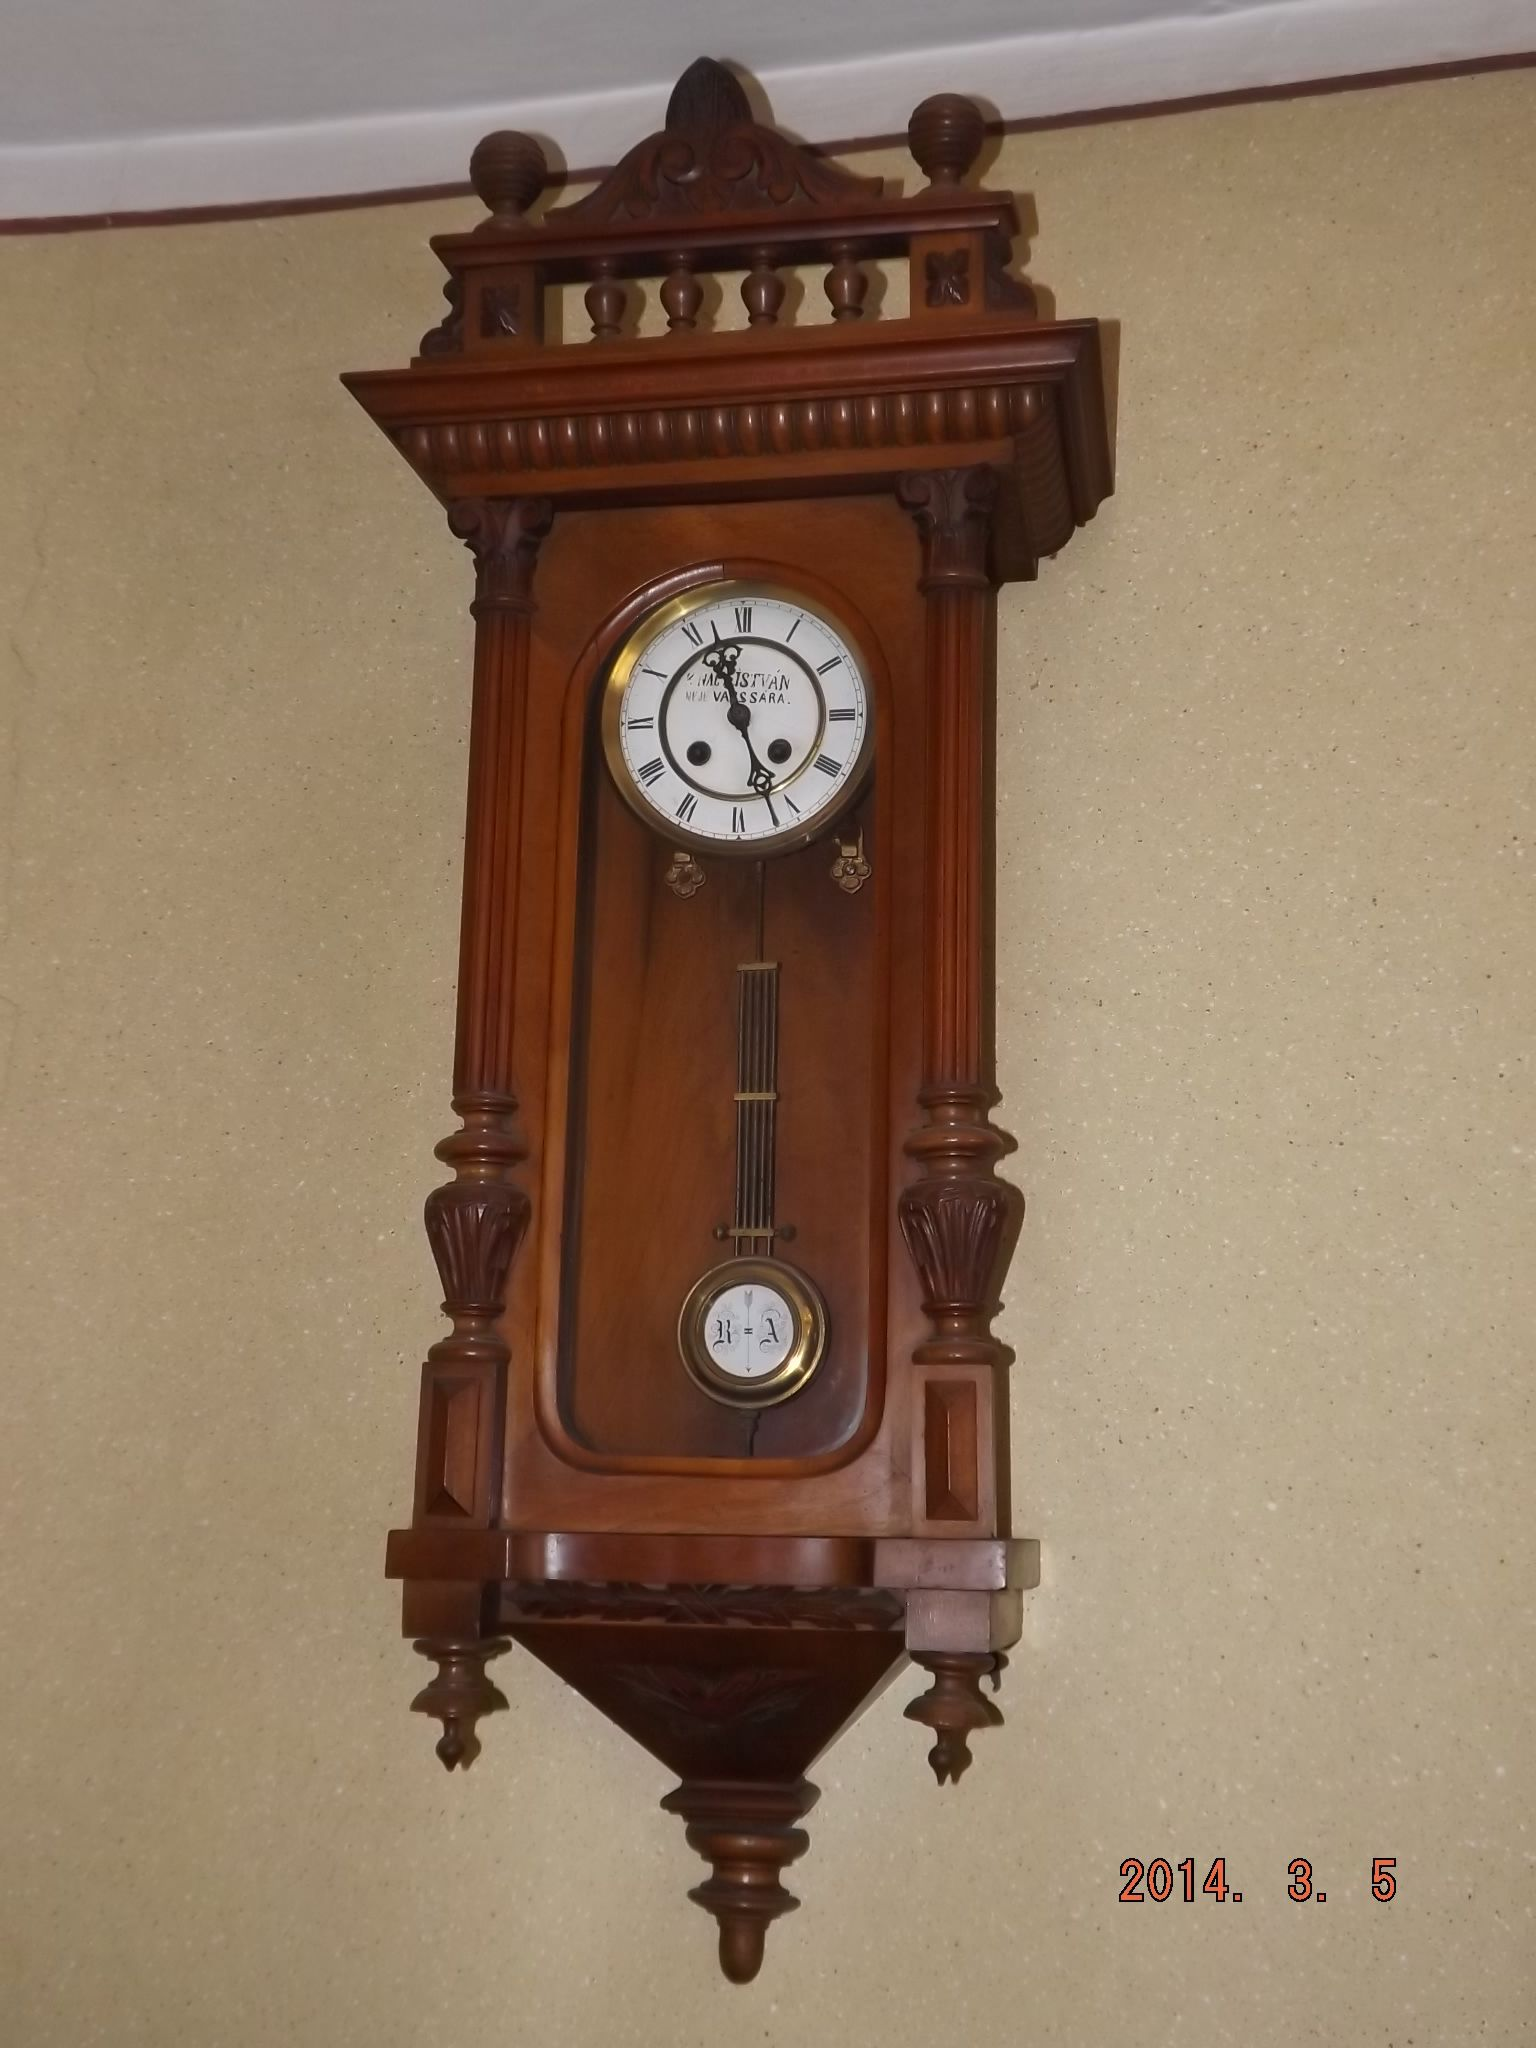 Kienzle wall clock Archives Blas heritageBlas heritage